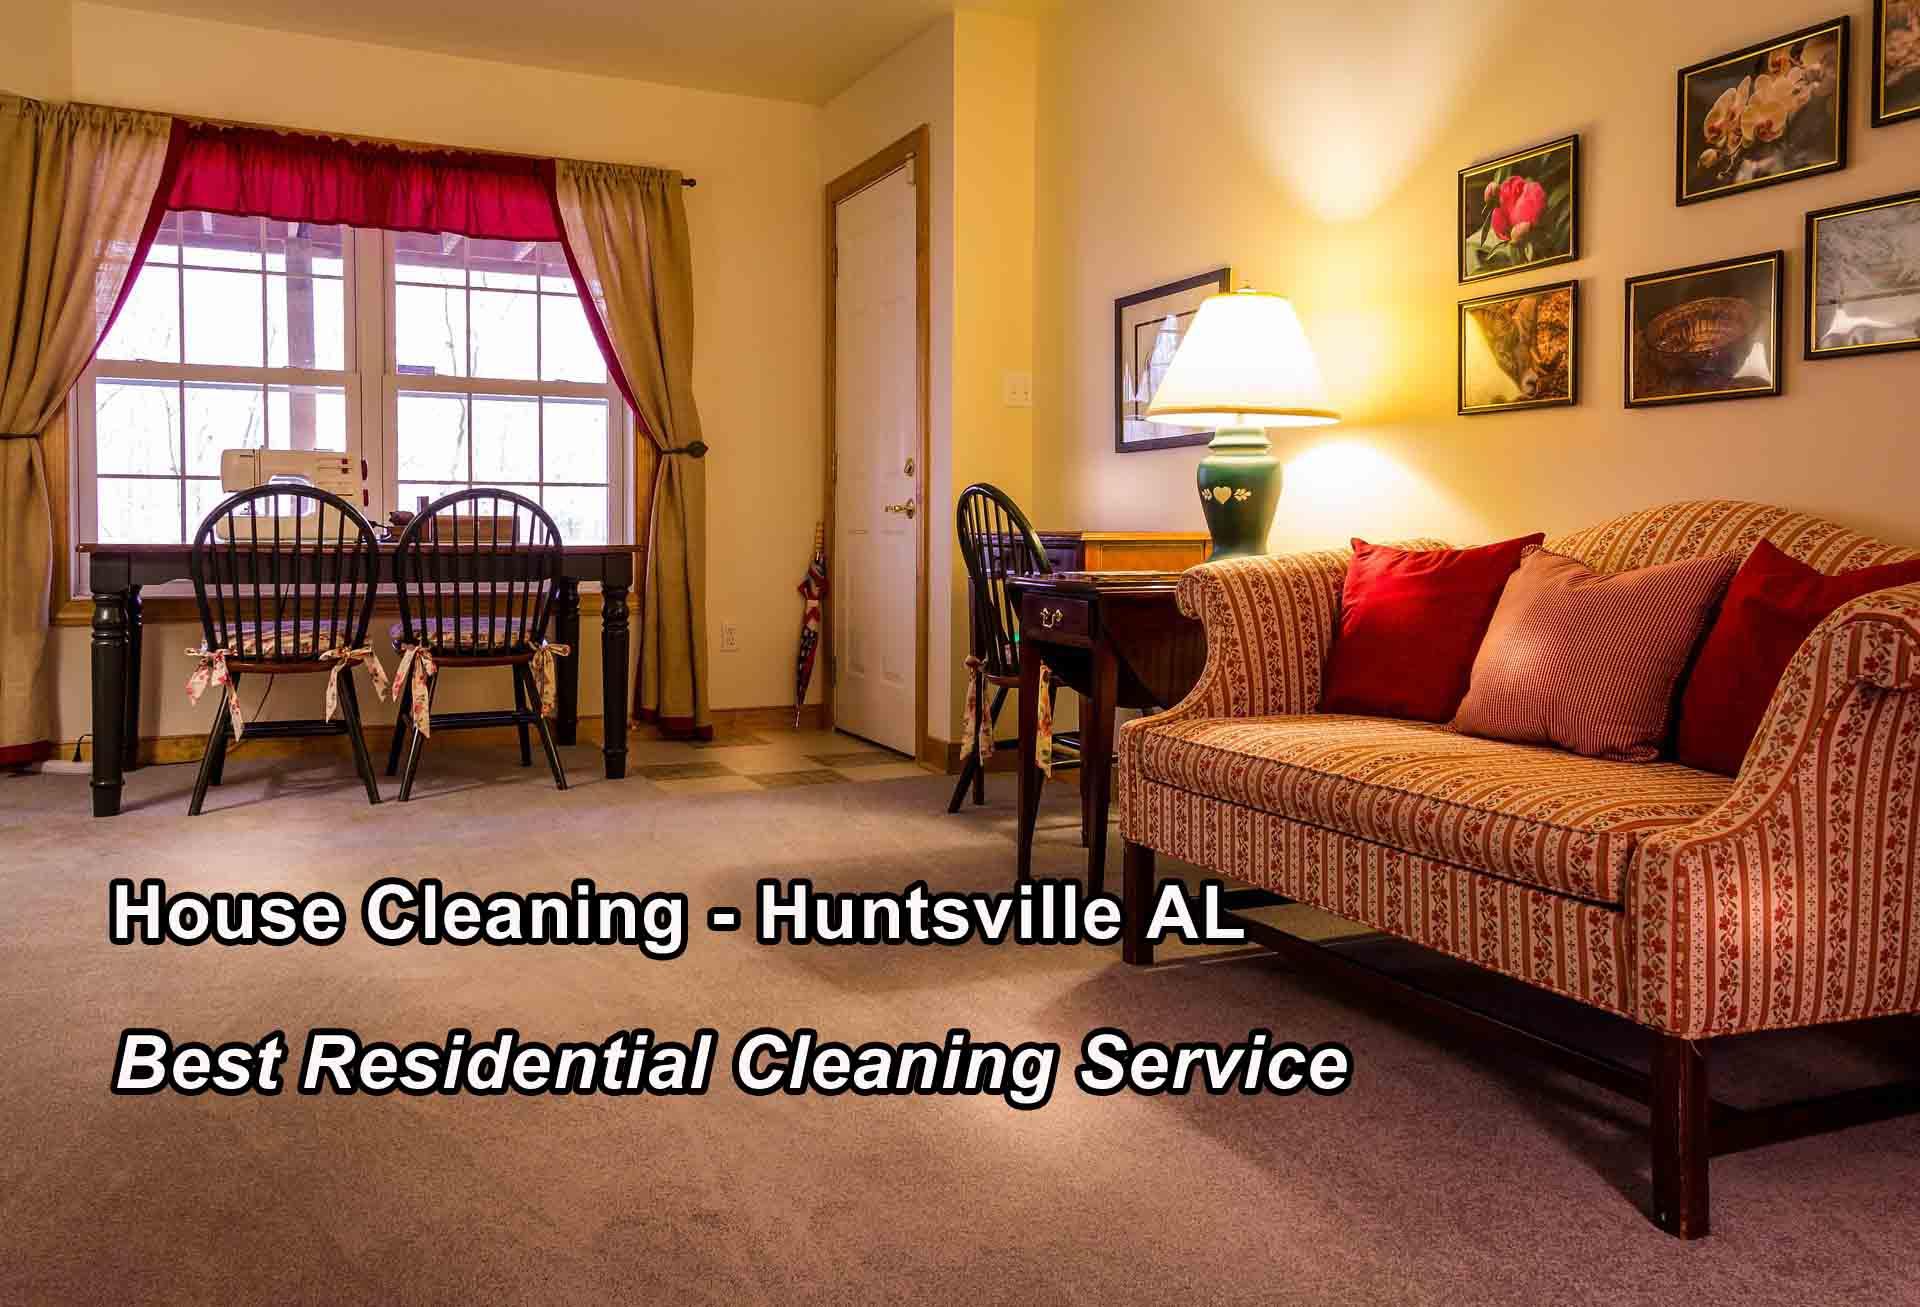 House Cleaning - Huntsville AL